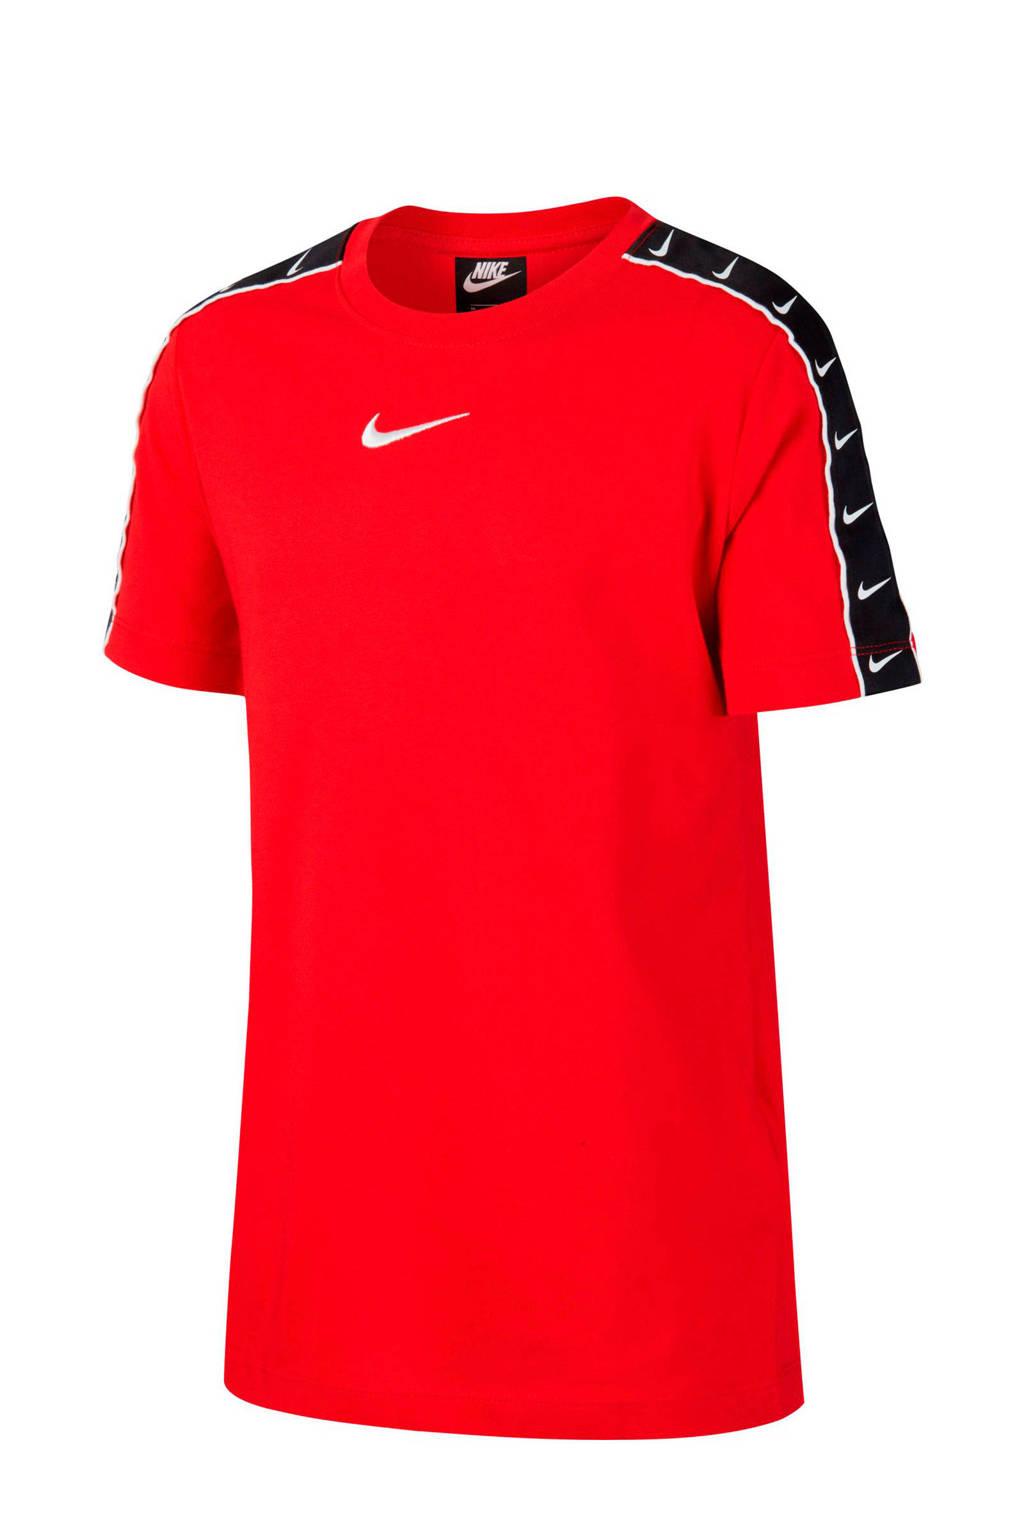 Nike T-shirt rood, Rood